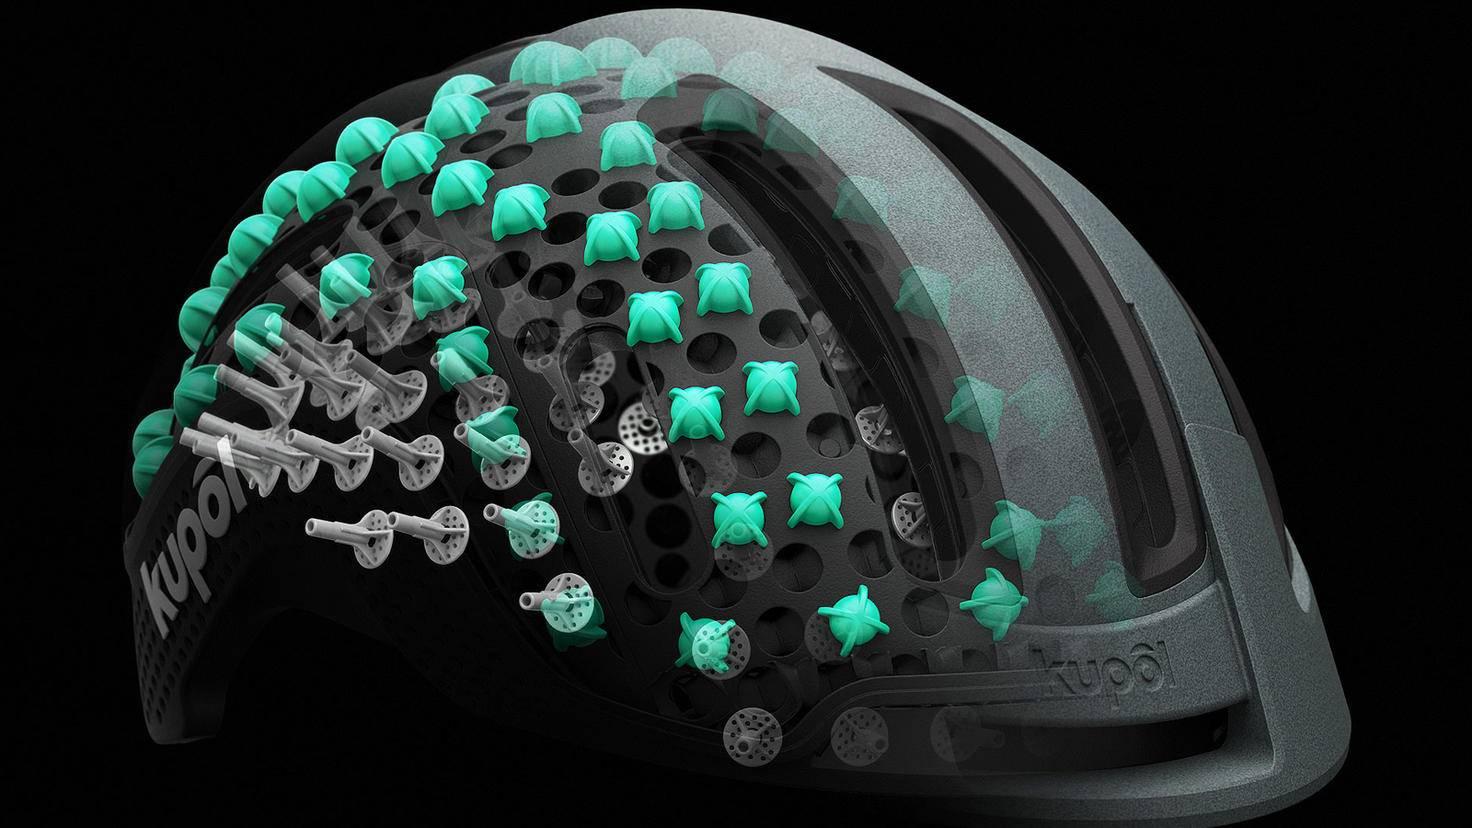 Fahrradhelm aus dem 3D-Drucker Kupol